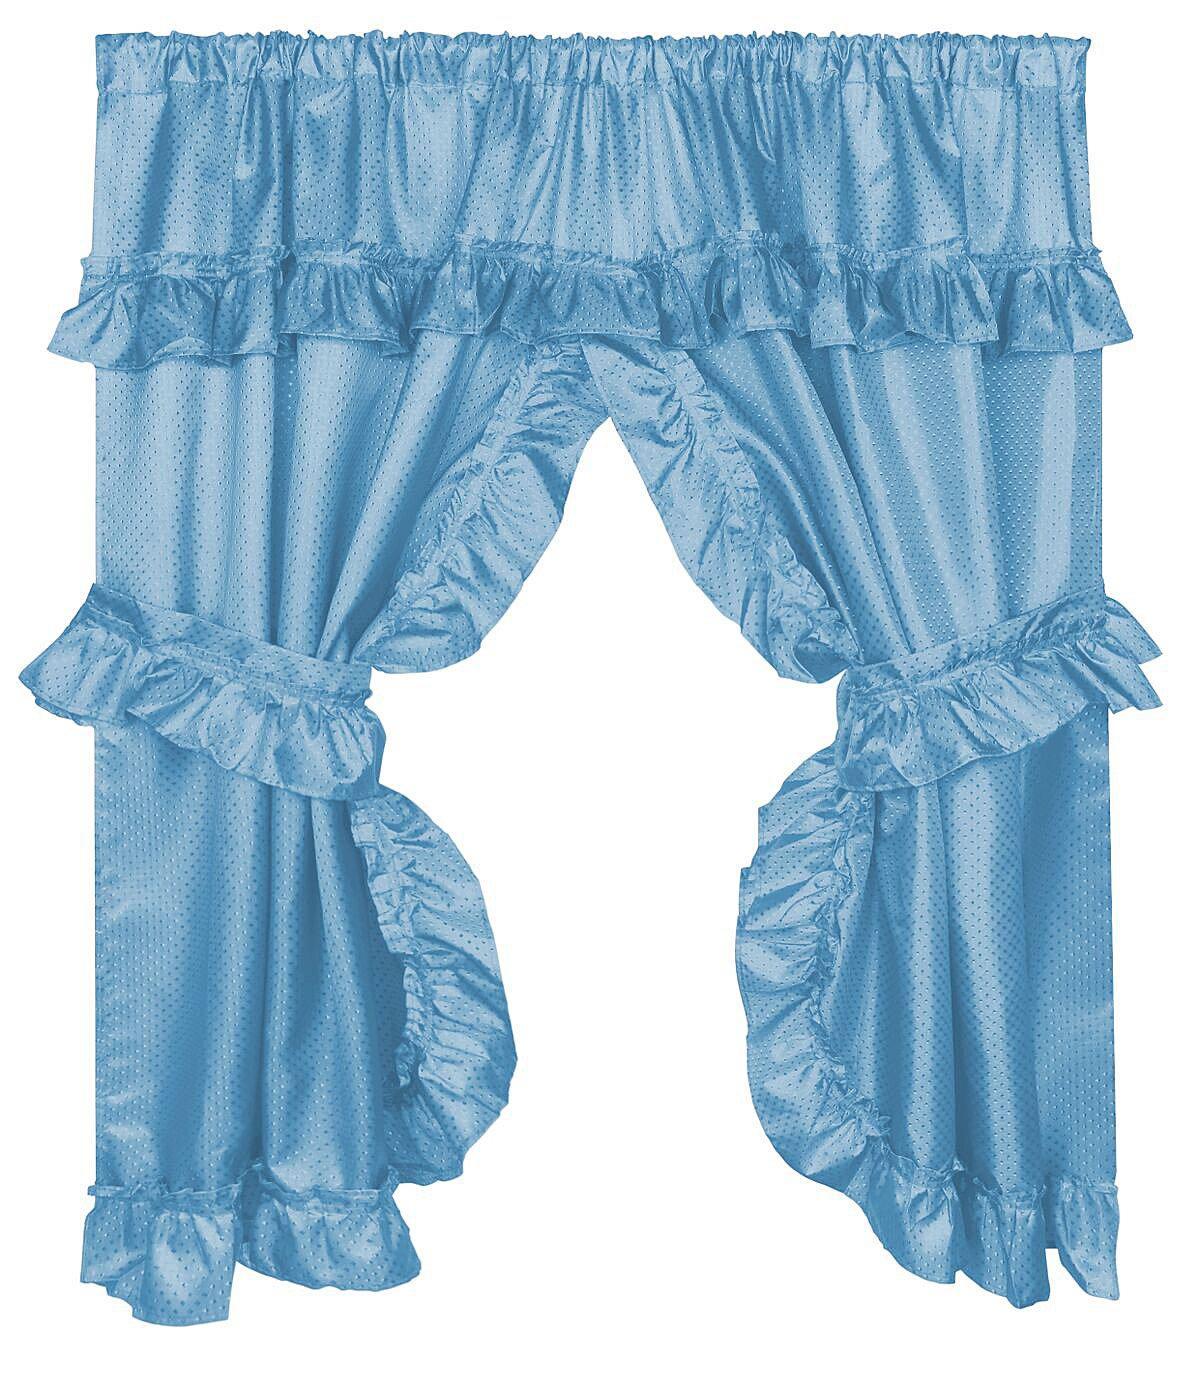 Diamond Dot Ruffled Fabric Bathroom Window Curtain With Attached Valance and Tiebacks - Light Blue